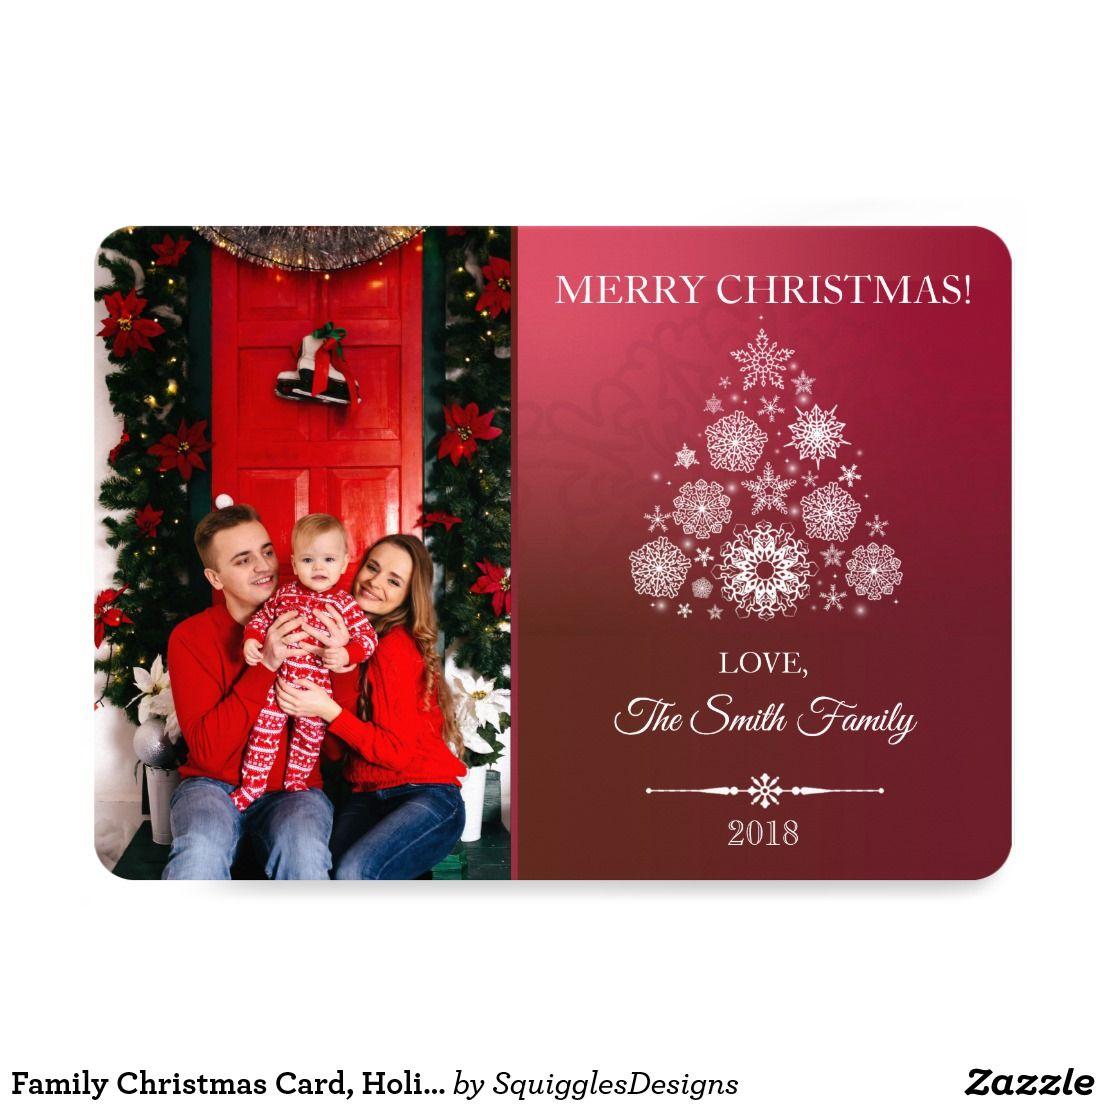 Family Christmas Card Holiday Photo Greeting Card Family Christmas Card Photos Holiday Photo Greeting Cards Family Christmas Cards